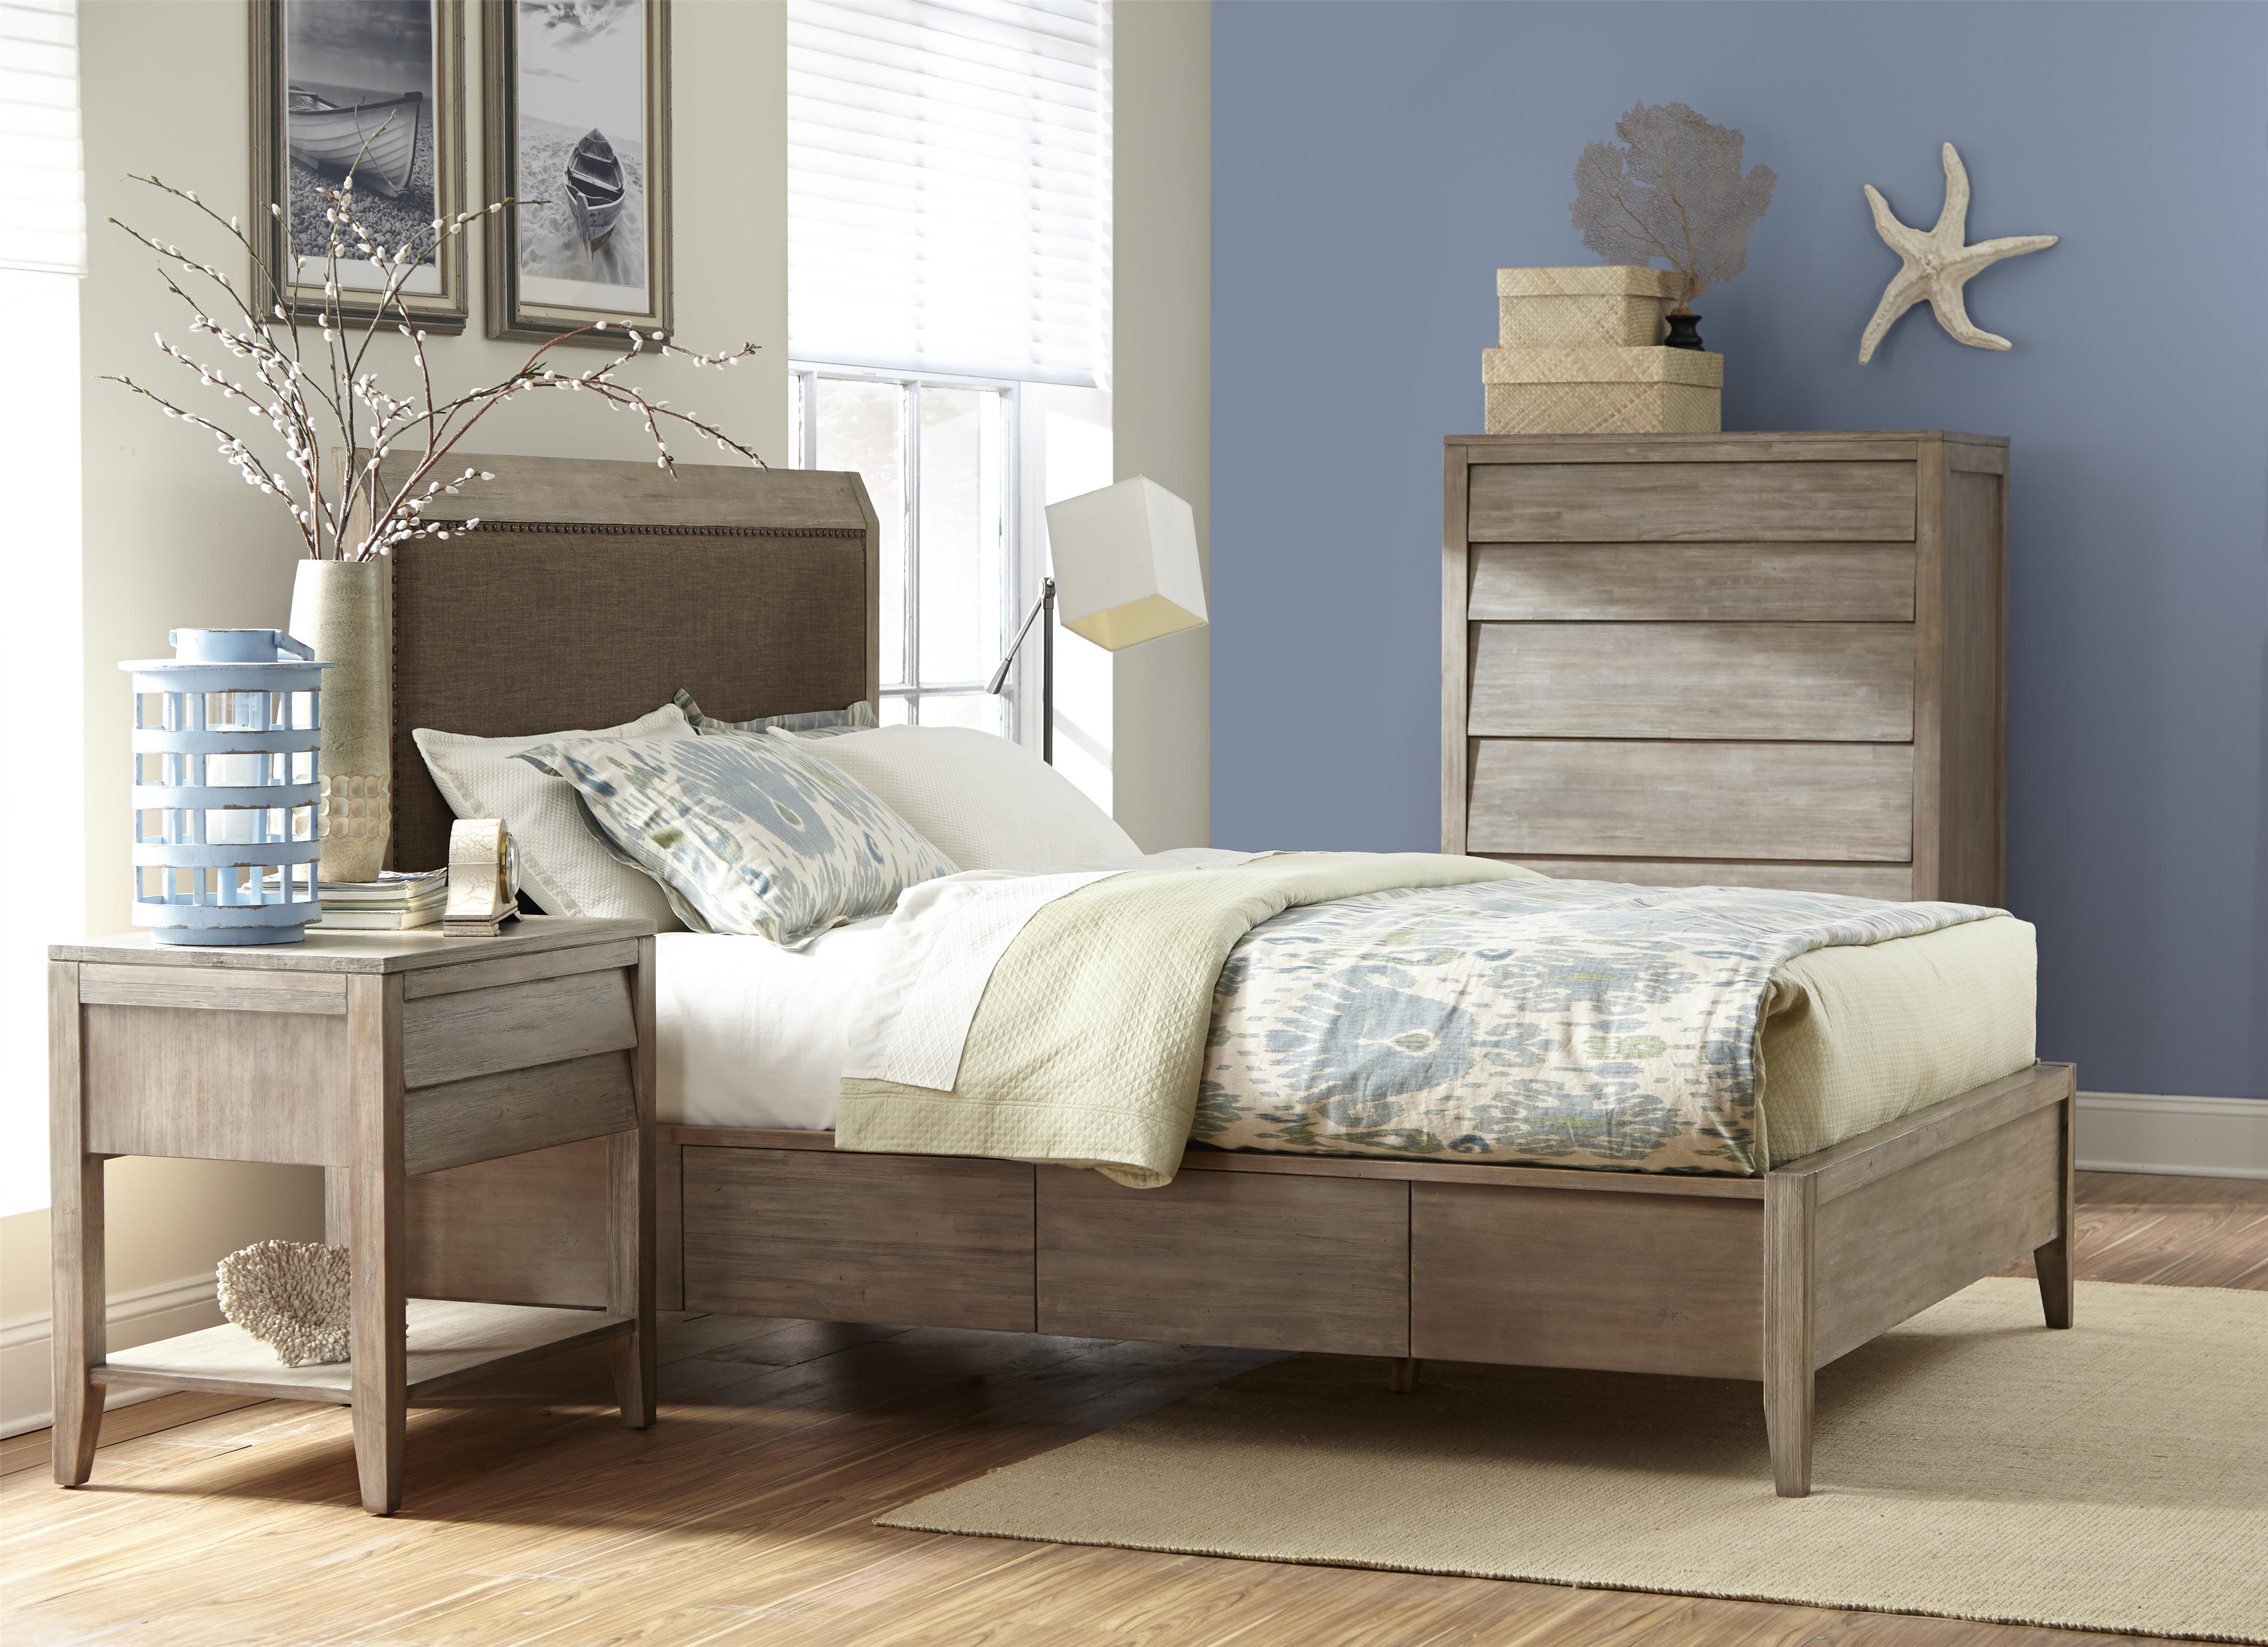 cresent fine furniture corliss landing queen upholstered low profile bed w storage ahfa. Black Bedroom Furniture Sets. Home Design Ideas